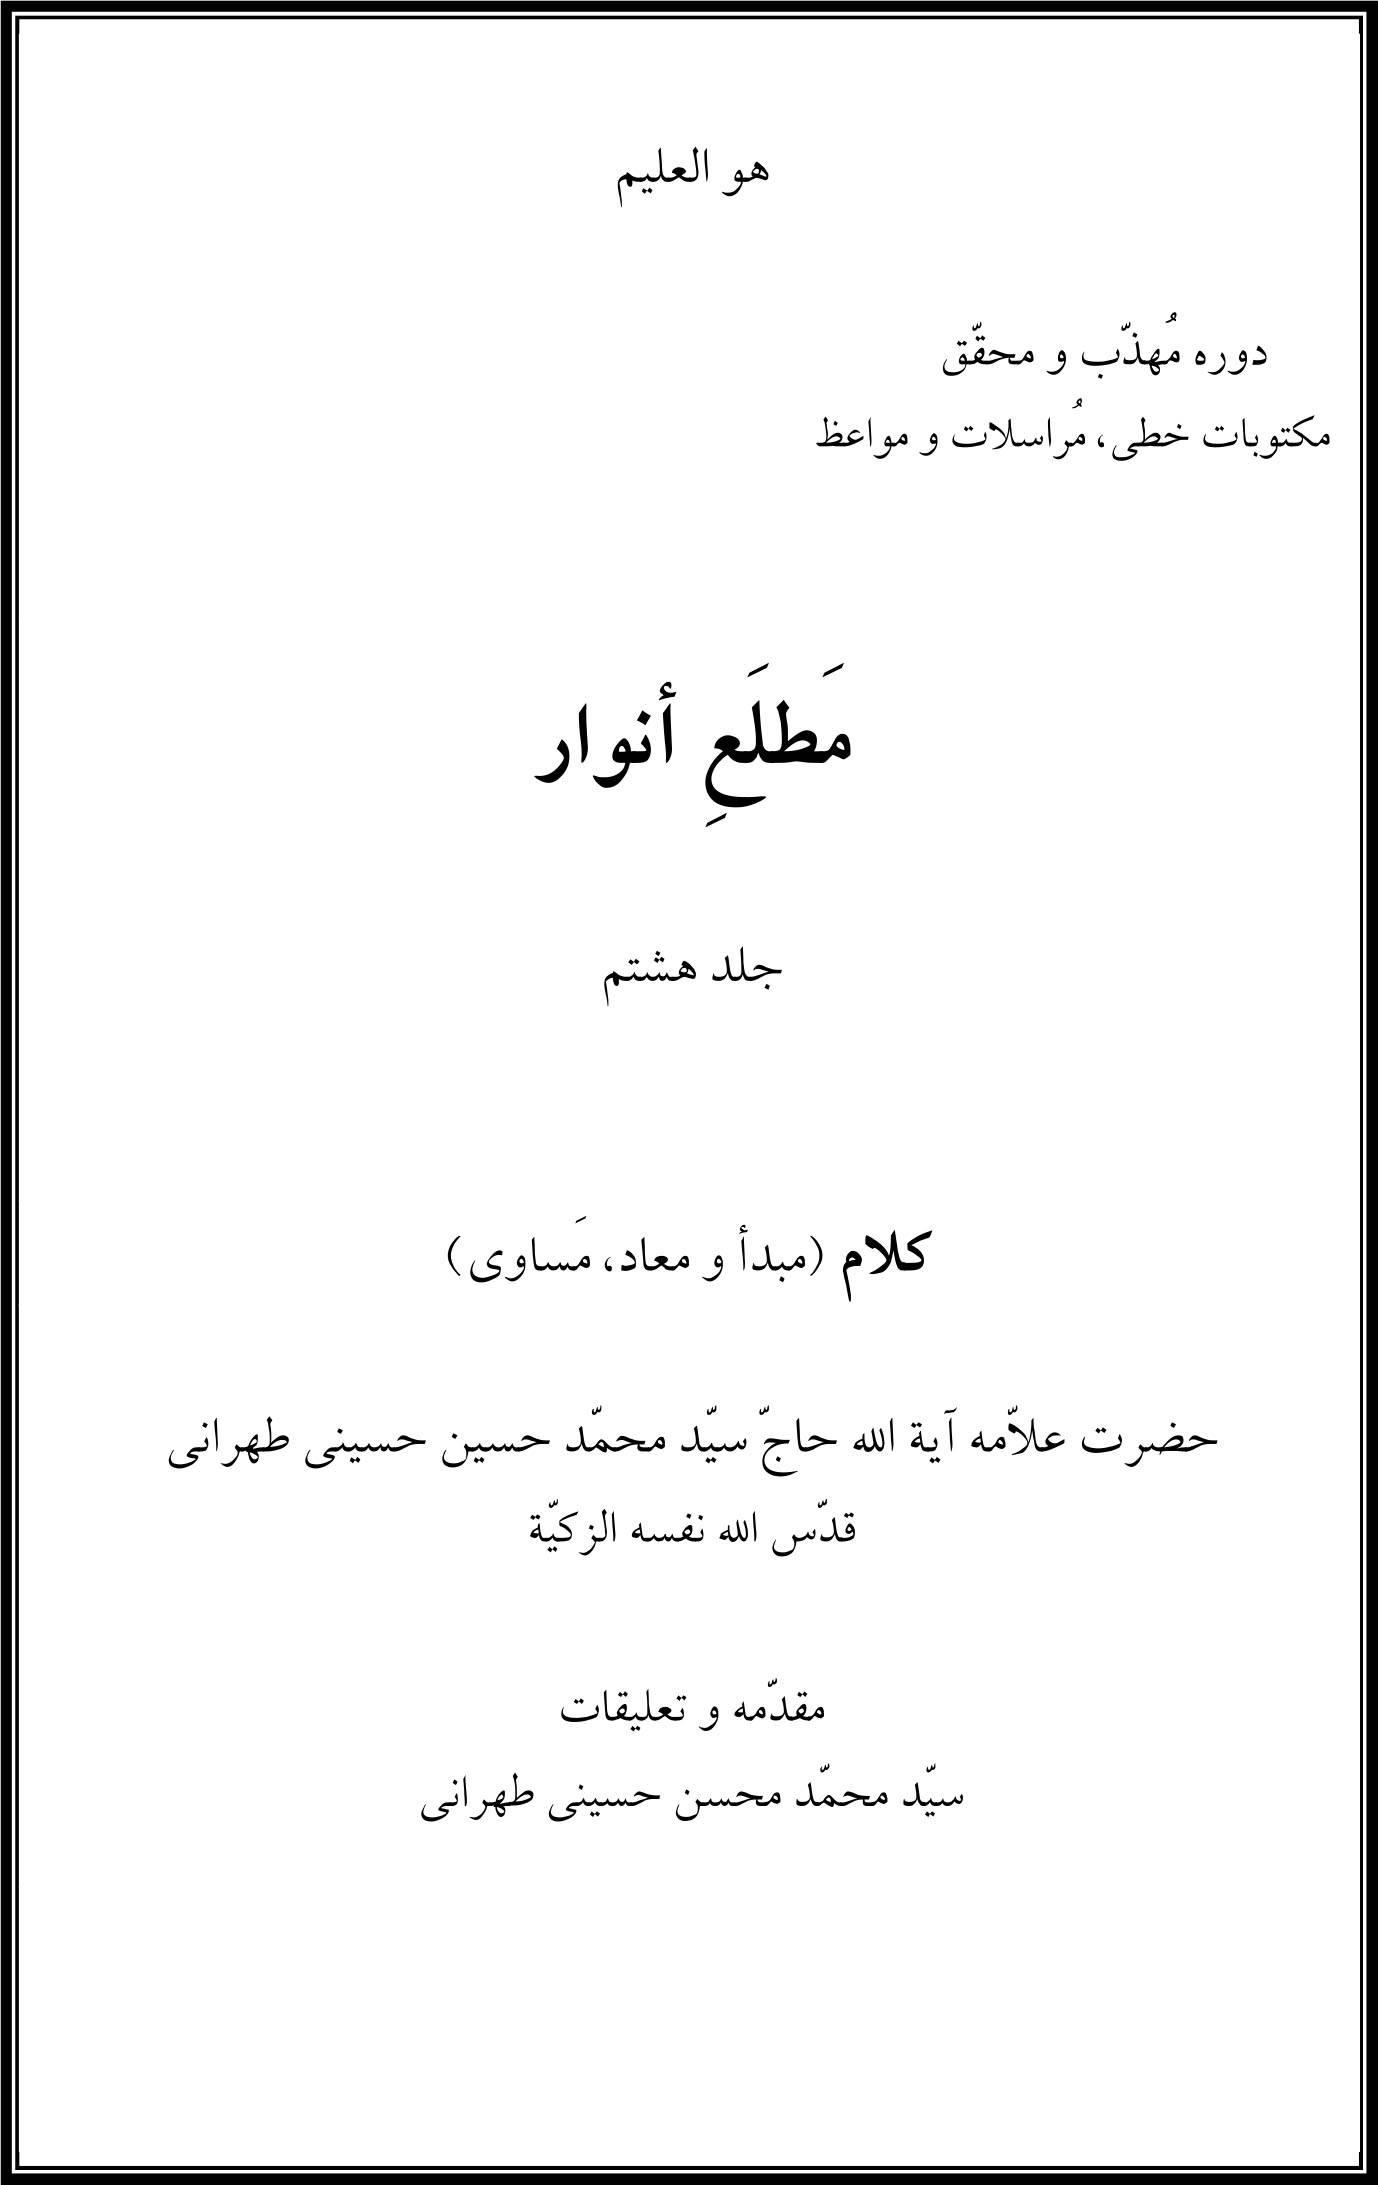 مطلع انوار ،جلد 8، علامه طهرانی